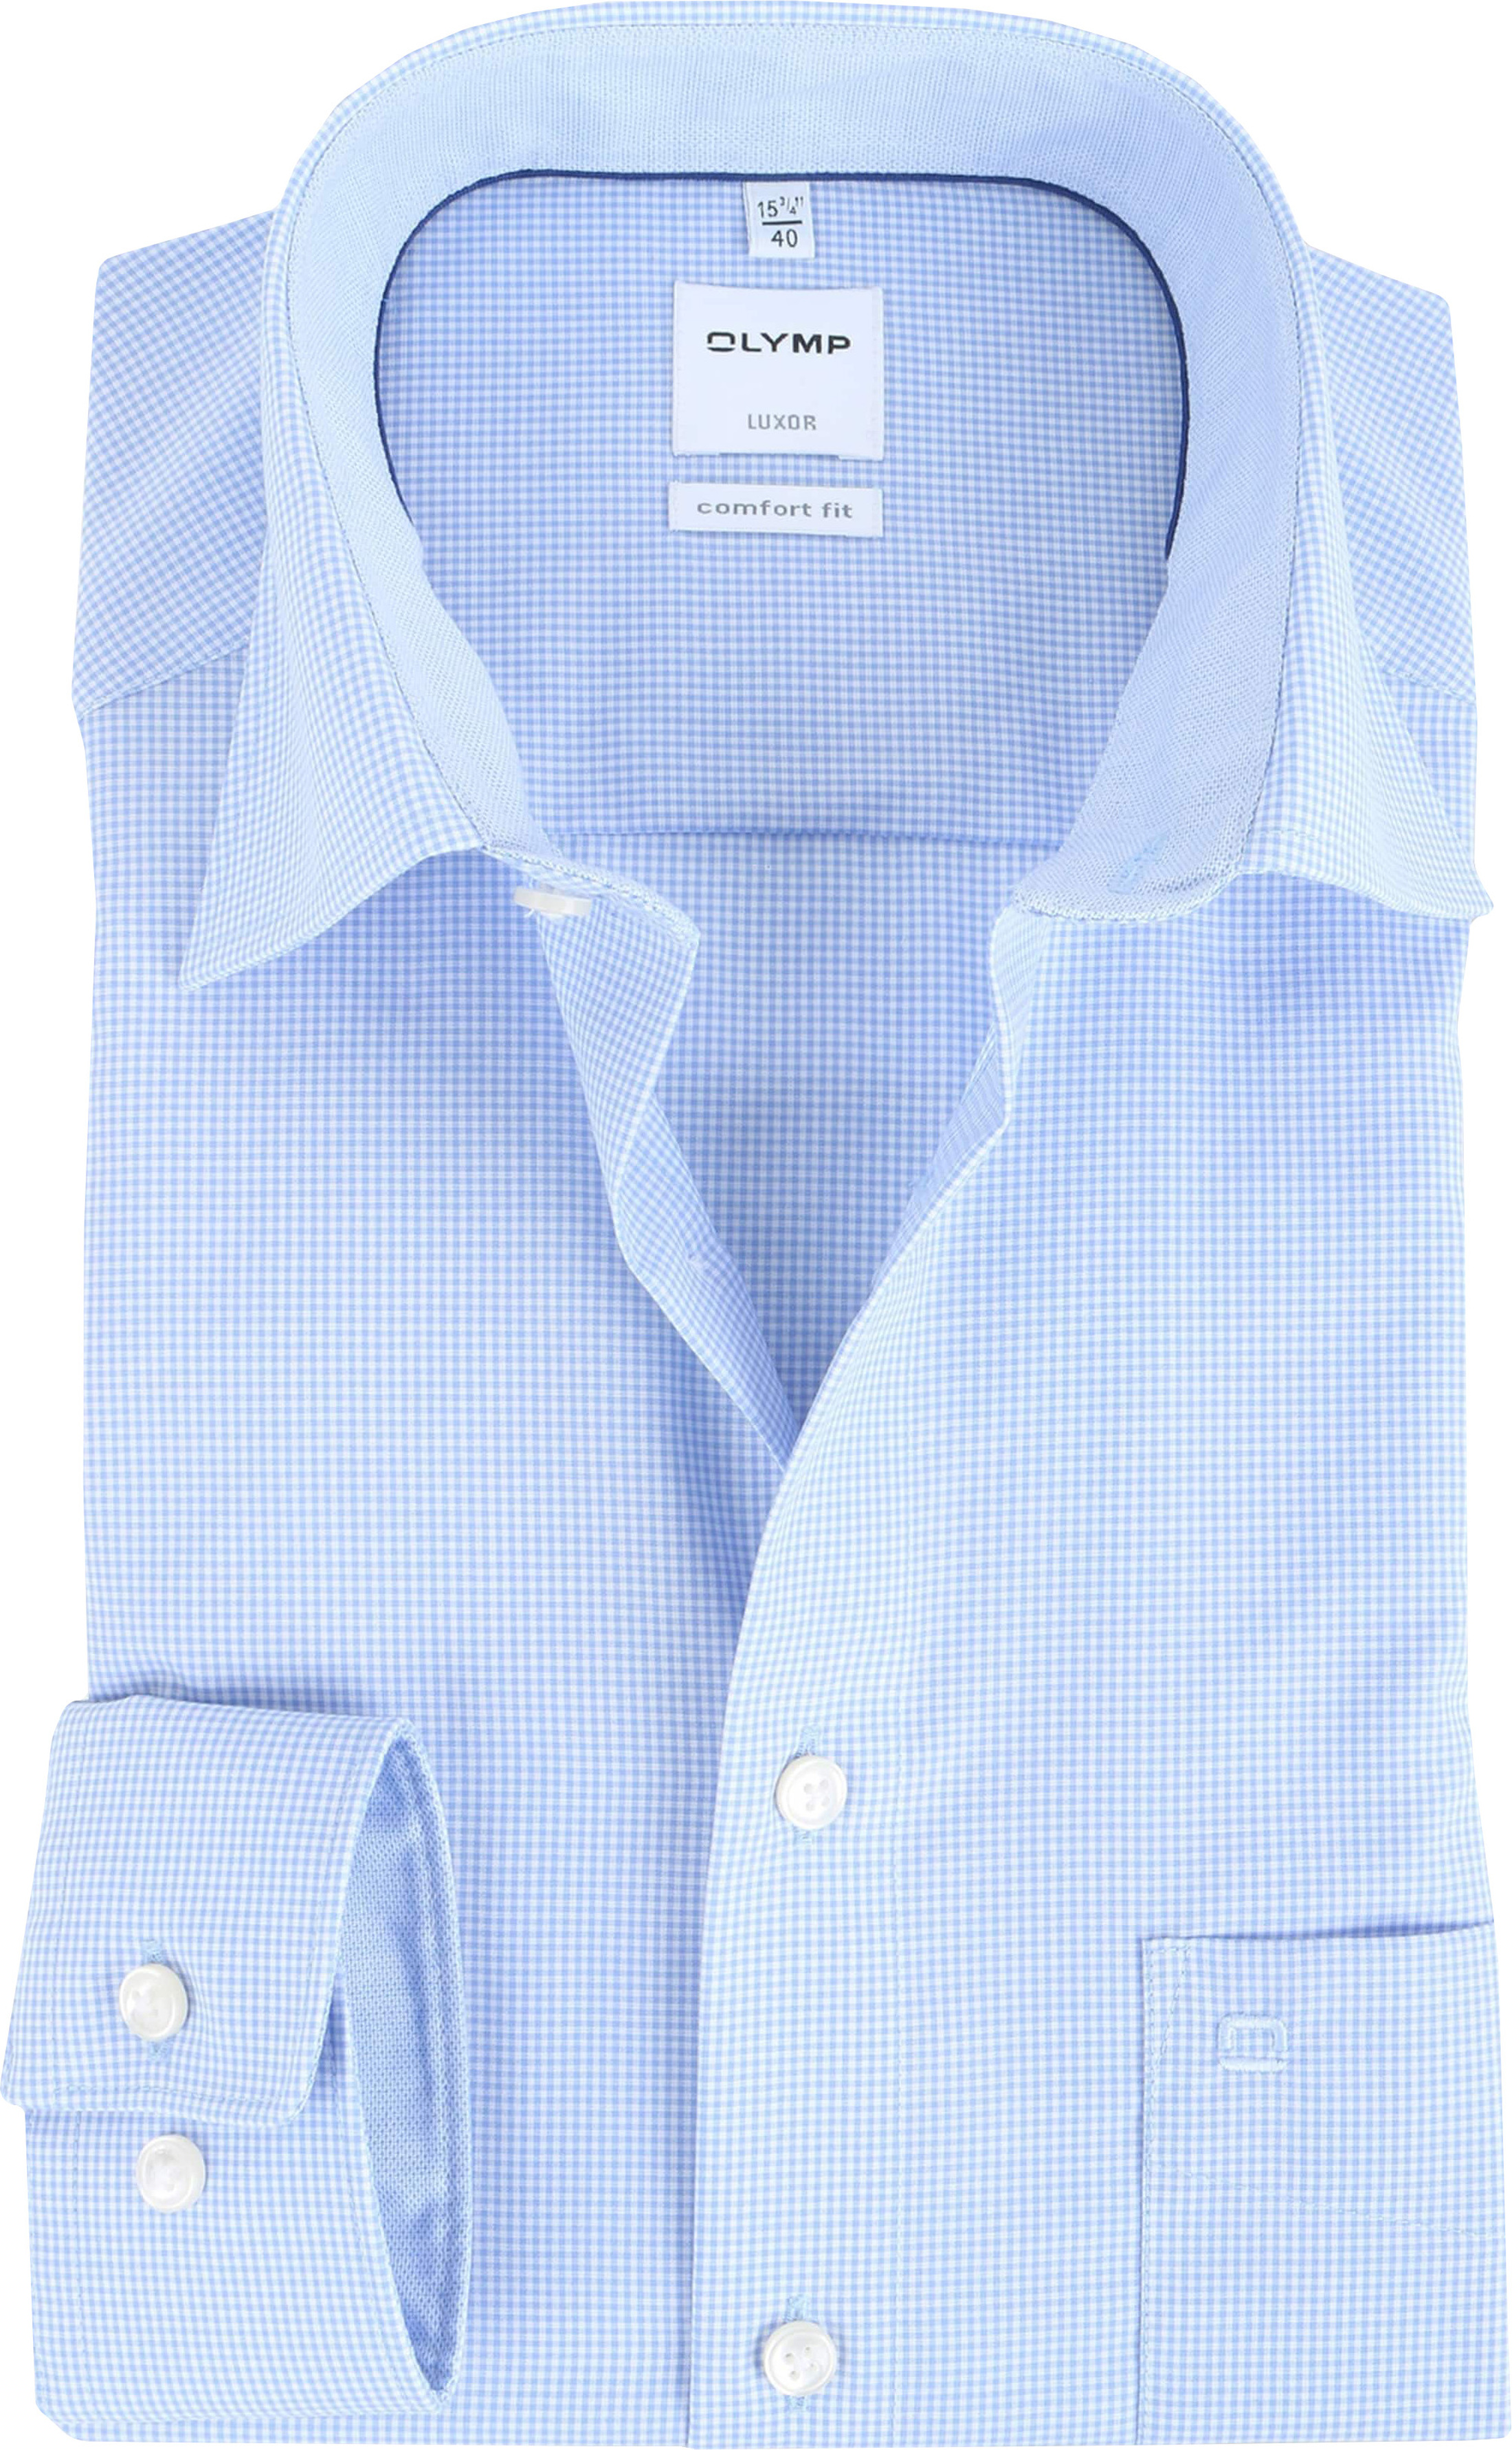 OLYMP Luxor Comfort Fit Shirt Blauw Ruit foto 0